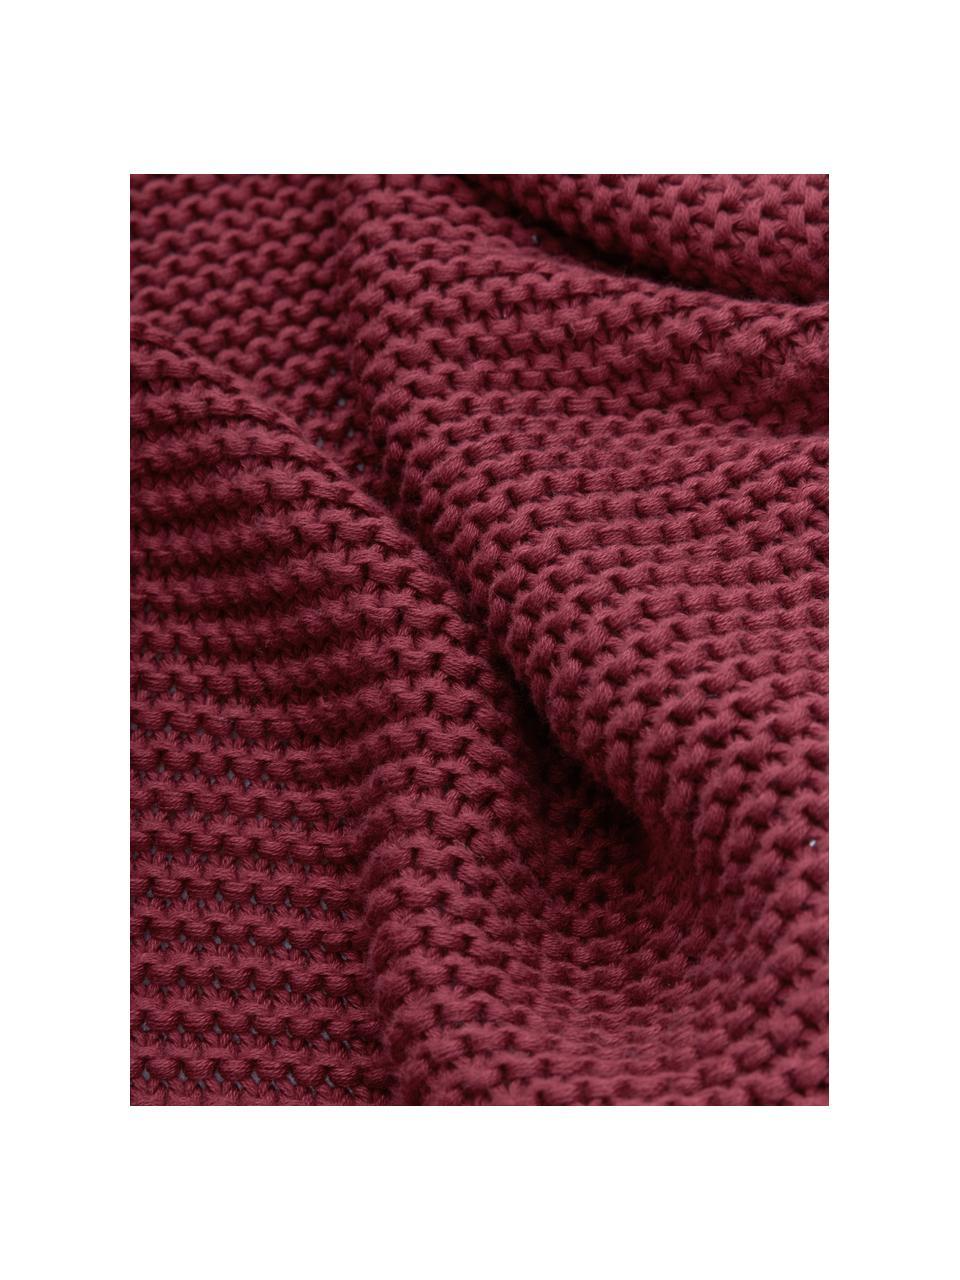 Strickdecke Adalyn aus Bio-Baumwolle in Dunkelrot, 100% Bio-Baumwolle, GOTS-zertifiziert, Dunkelrot, 150 x 200 cm